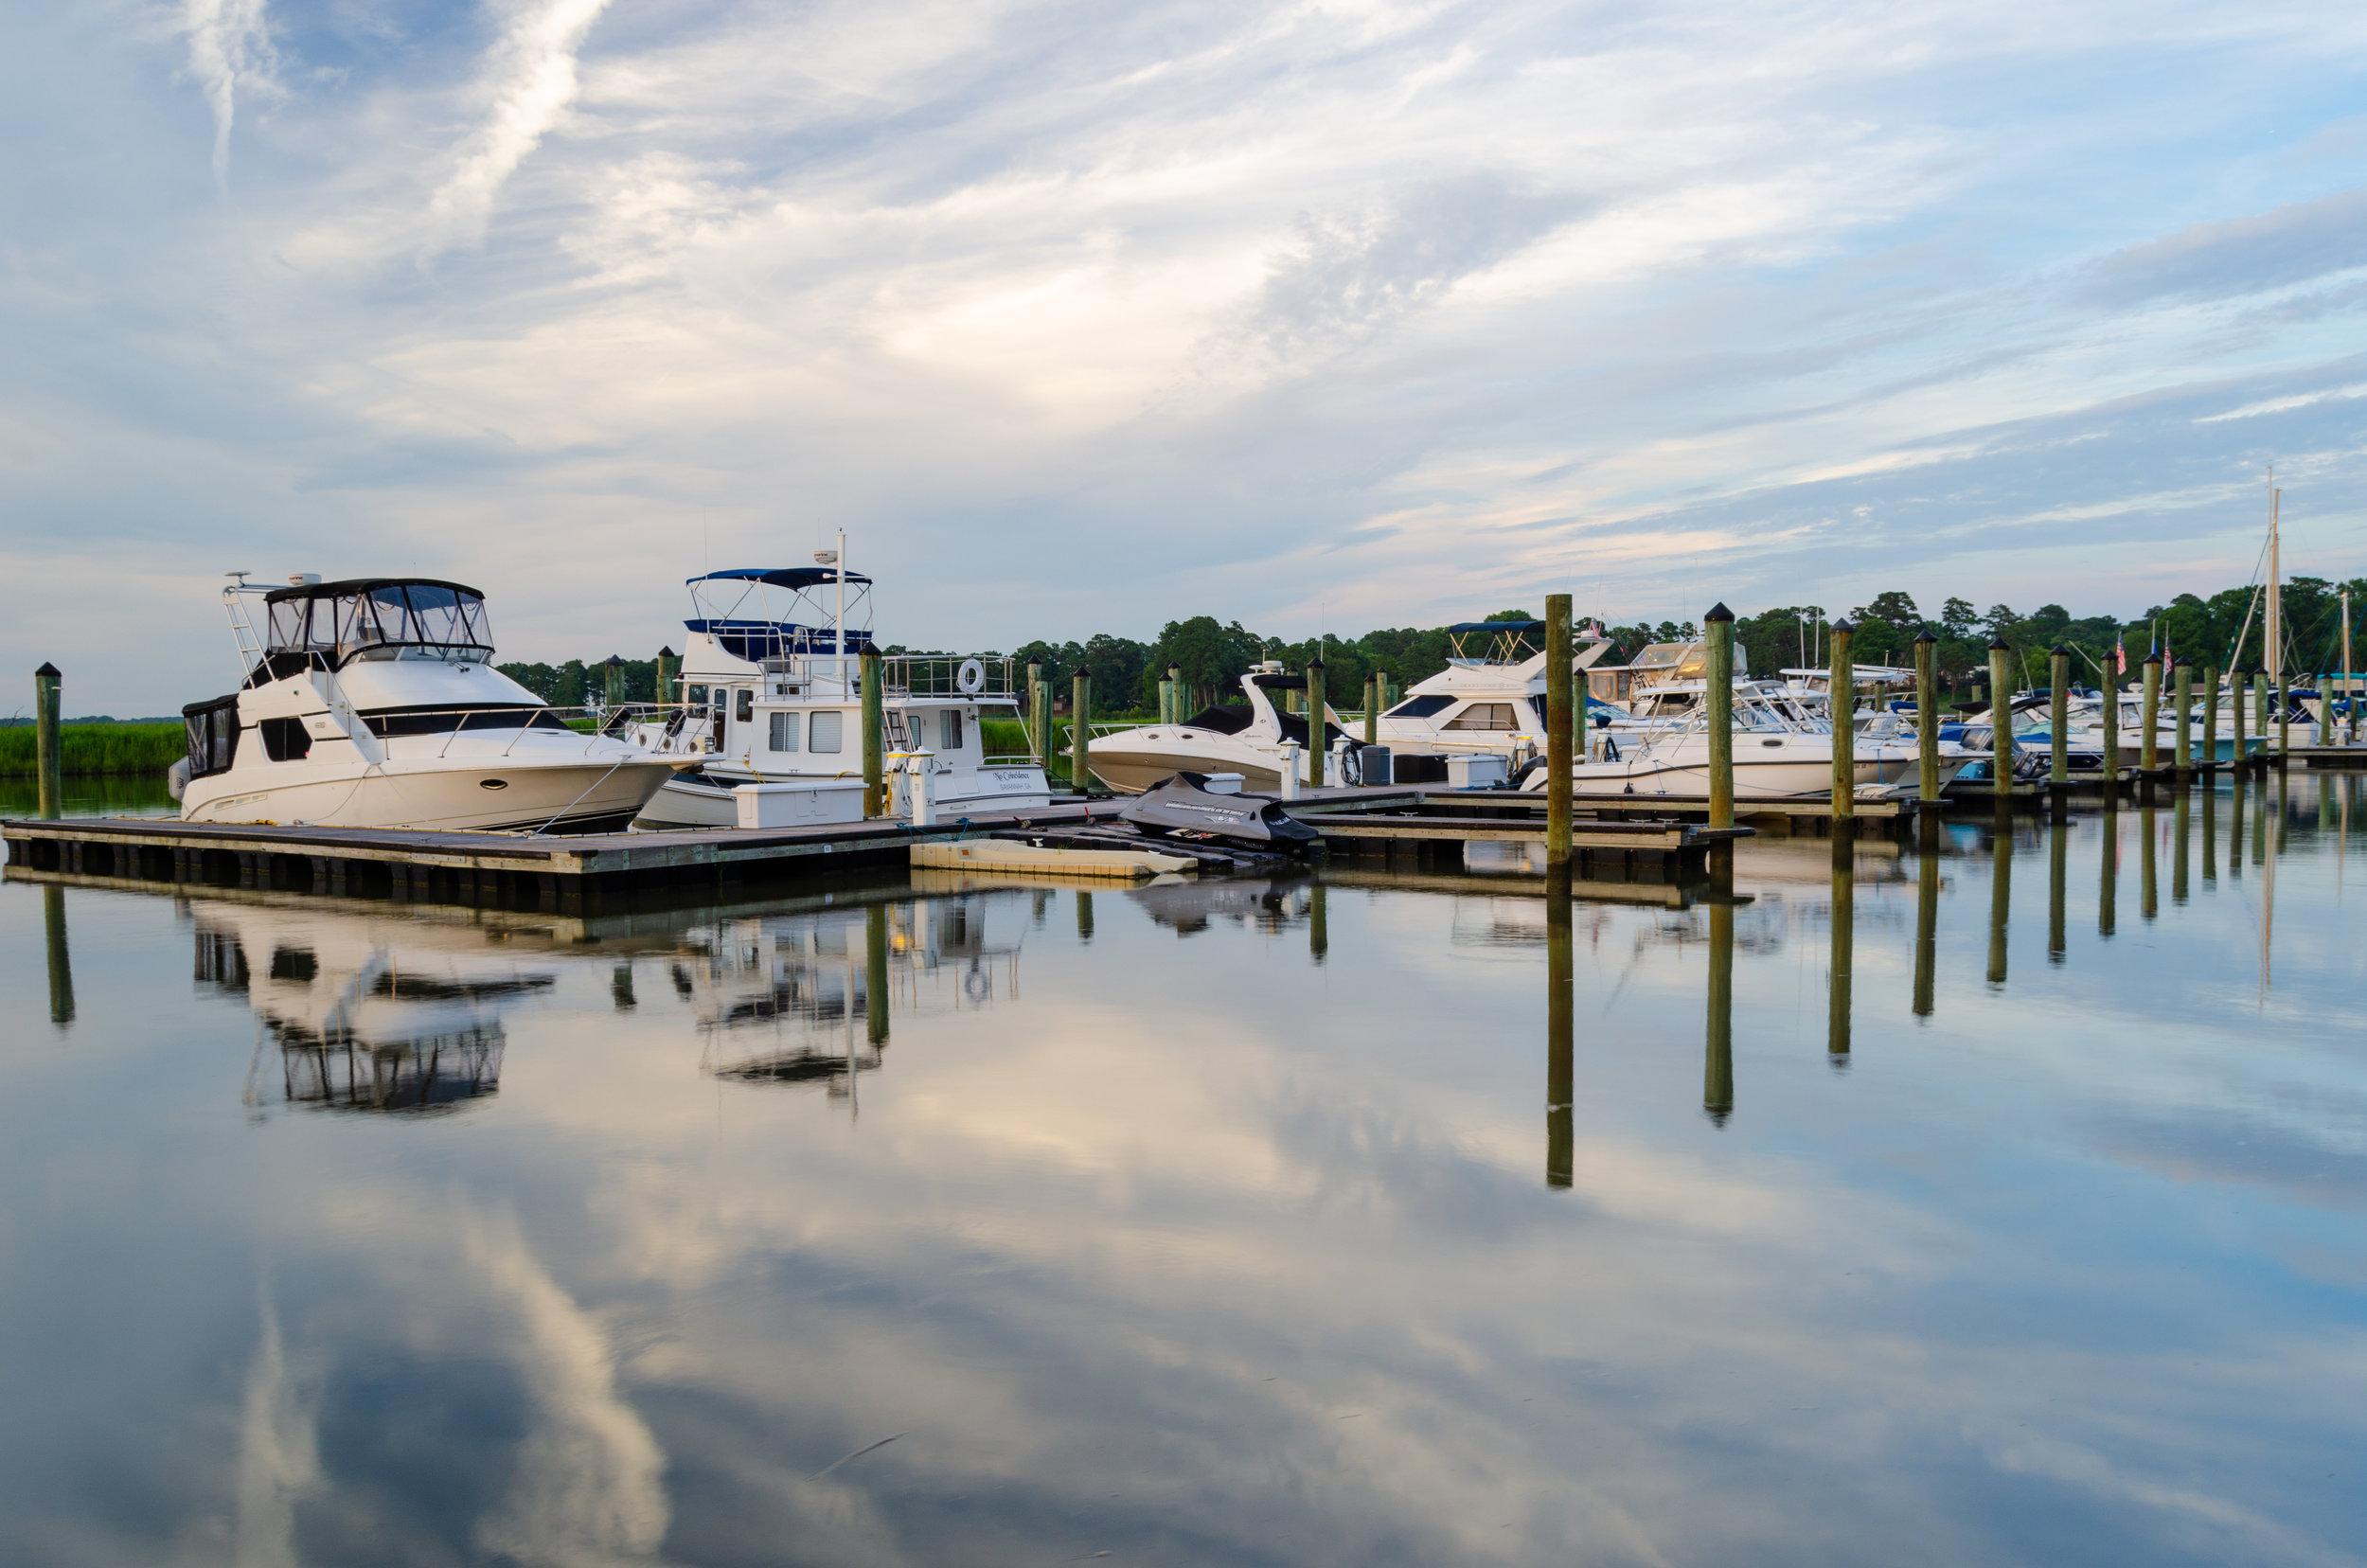 Smithfield-Isle of Wight County-Virginia-boats-marina-clouds-reflection-water.JPG